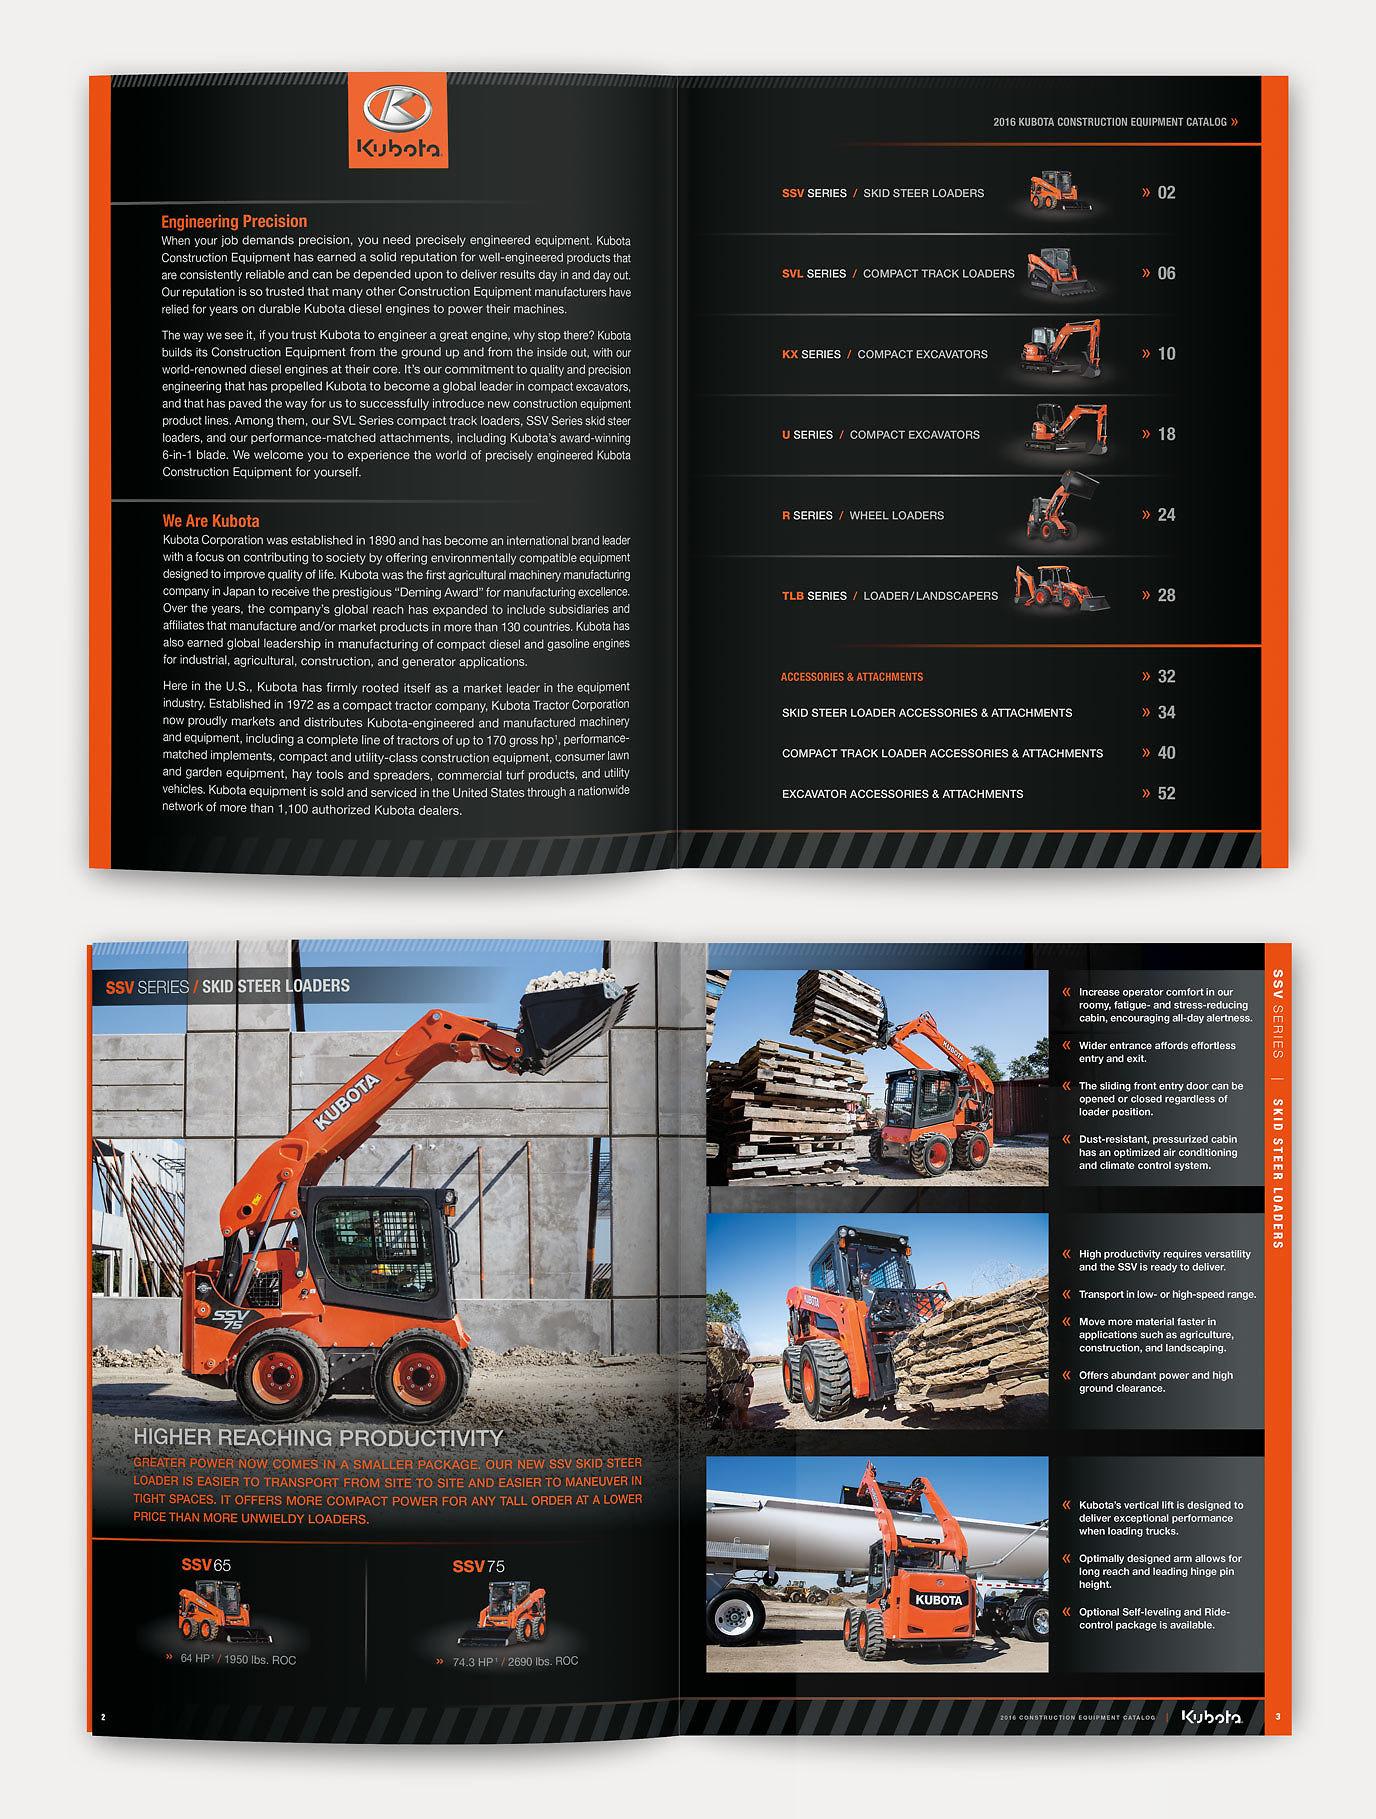 Kubota contruction equiplment catalog spreads